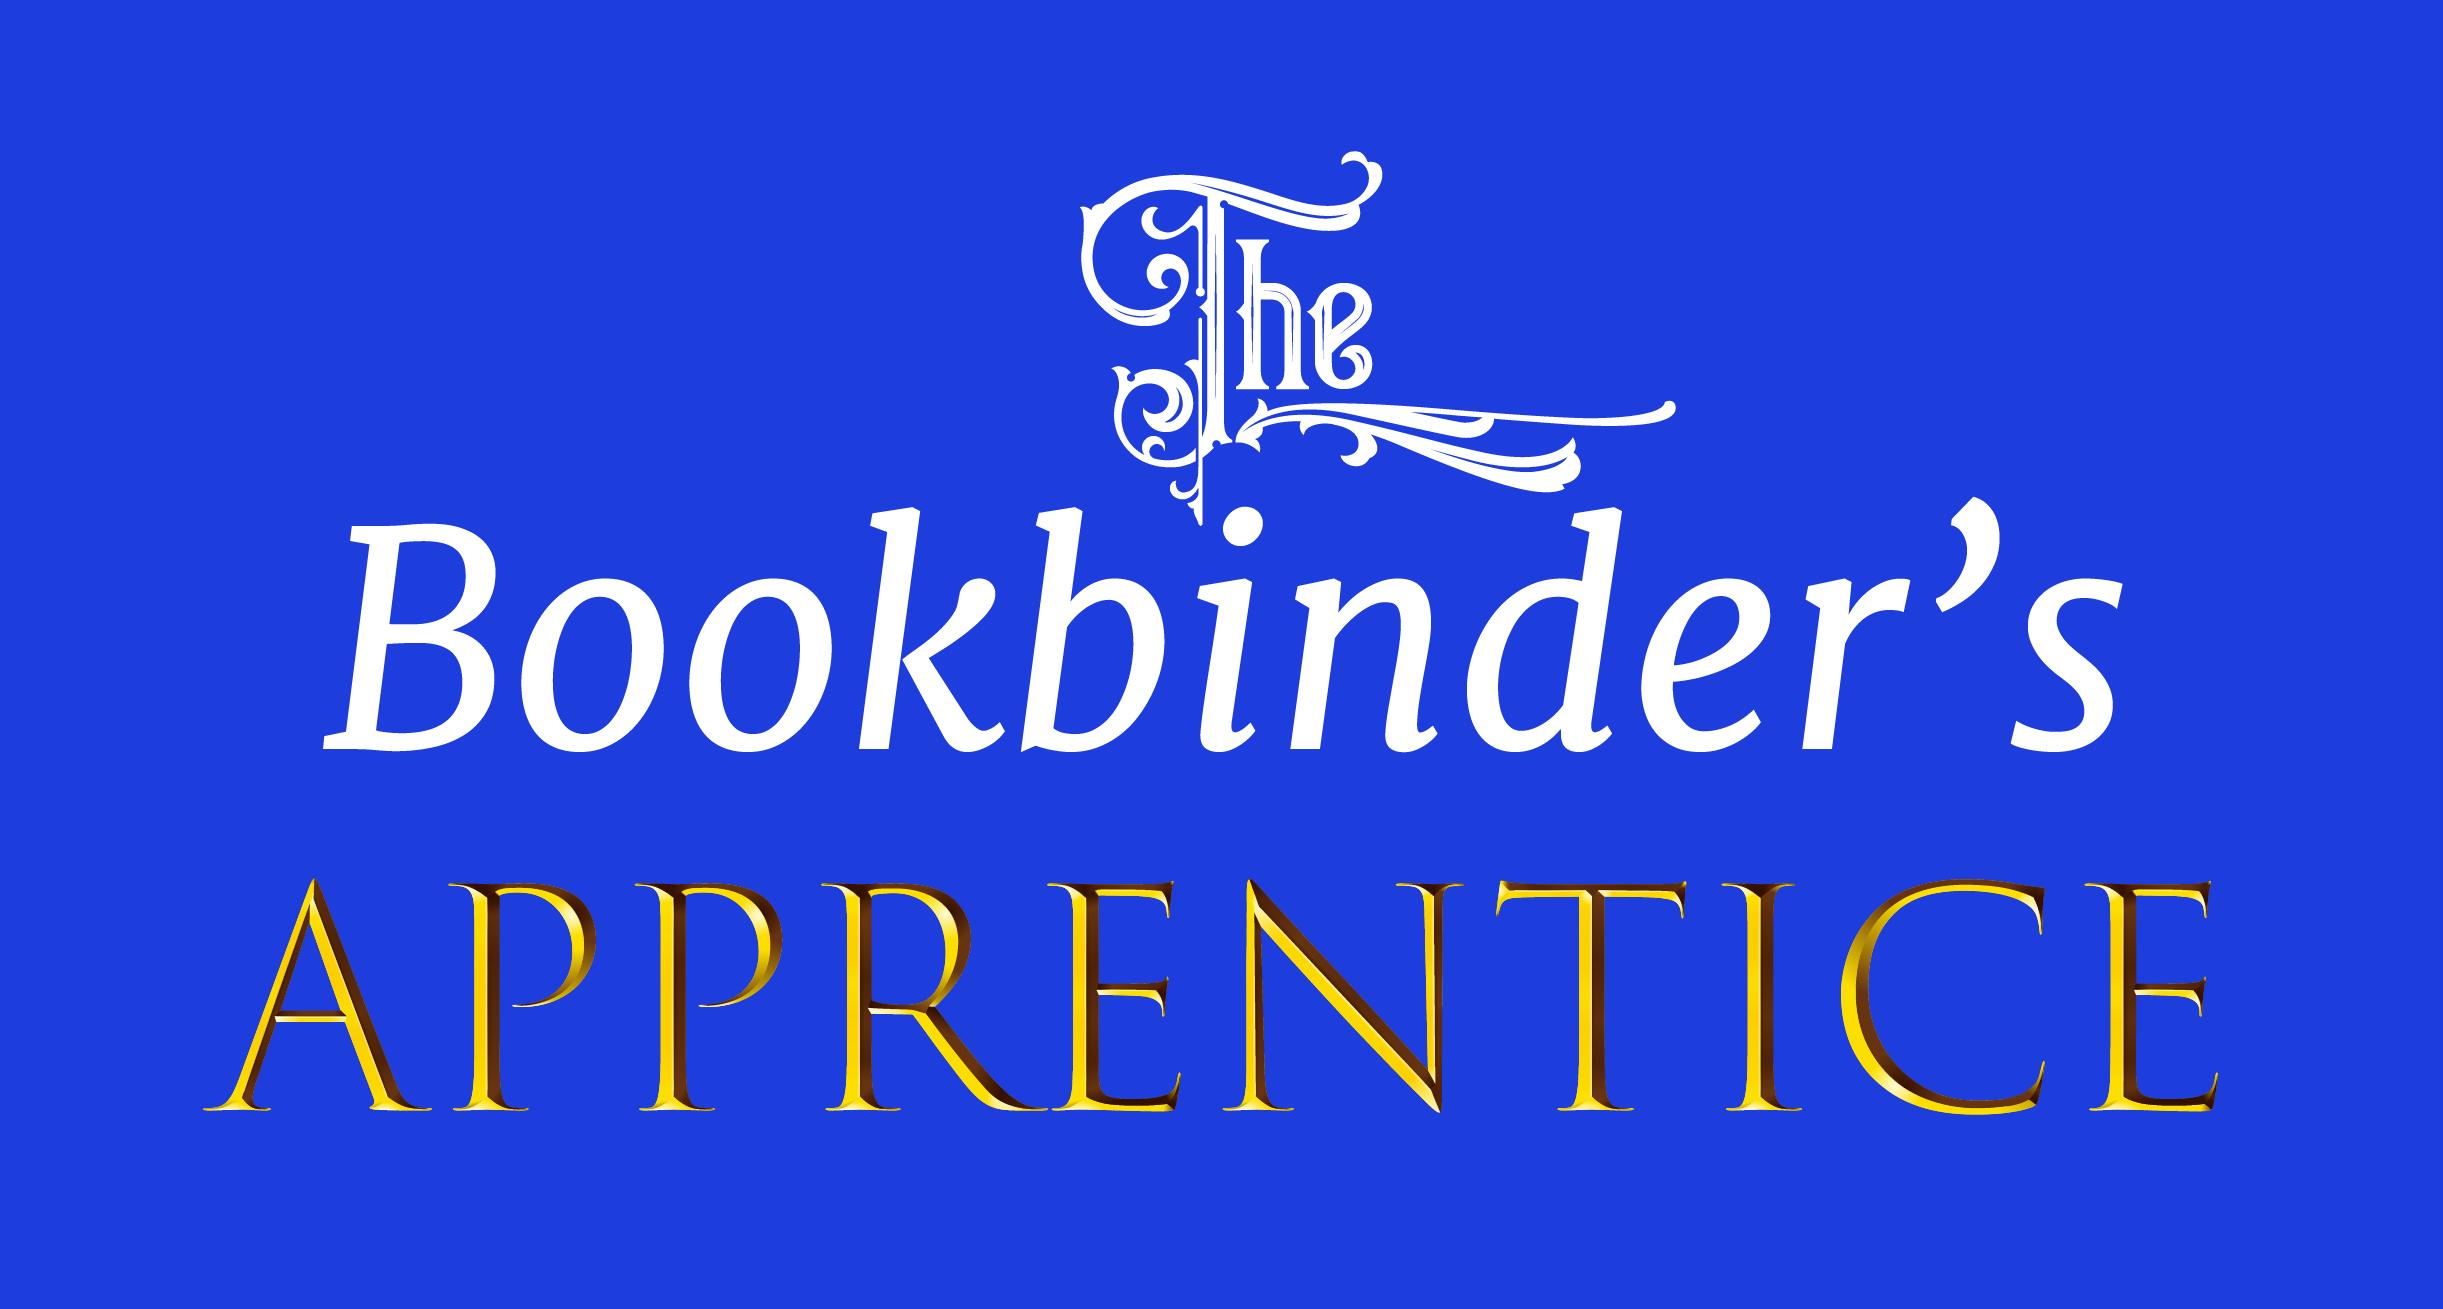 The Bookbinder's Apprentice Logo